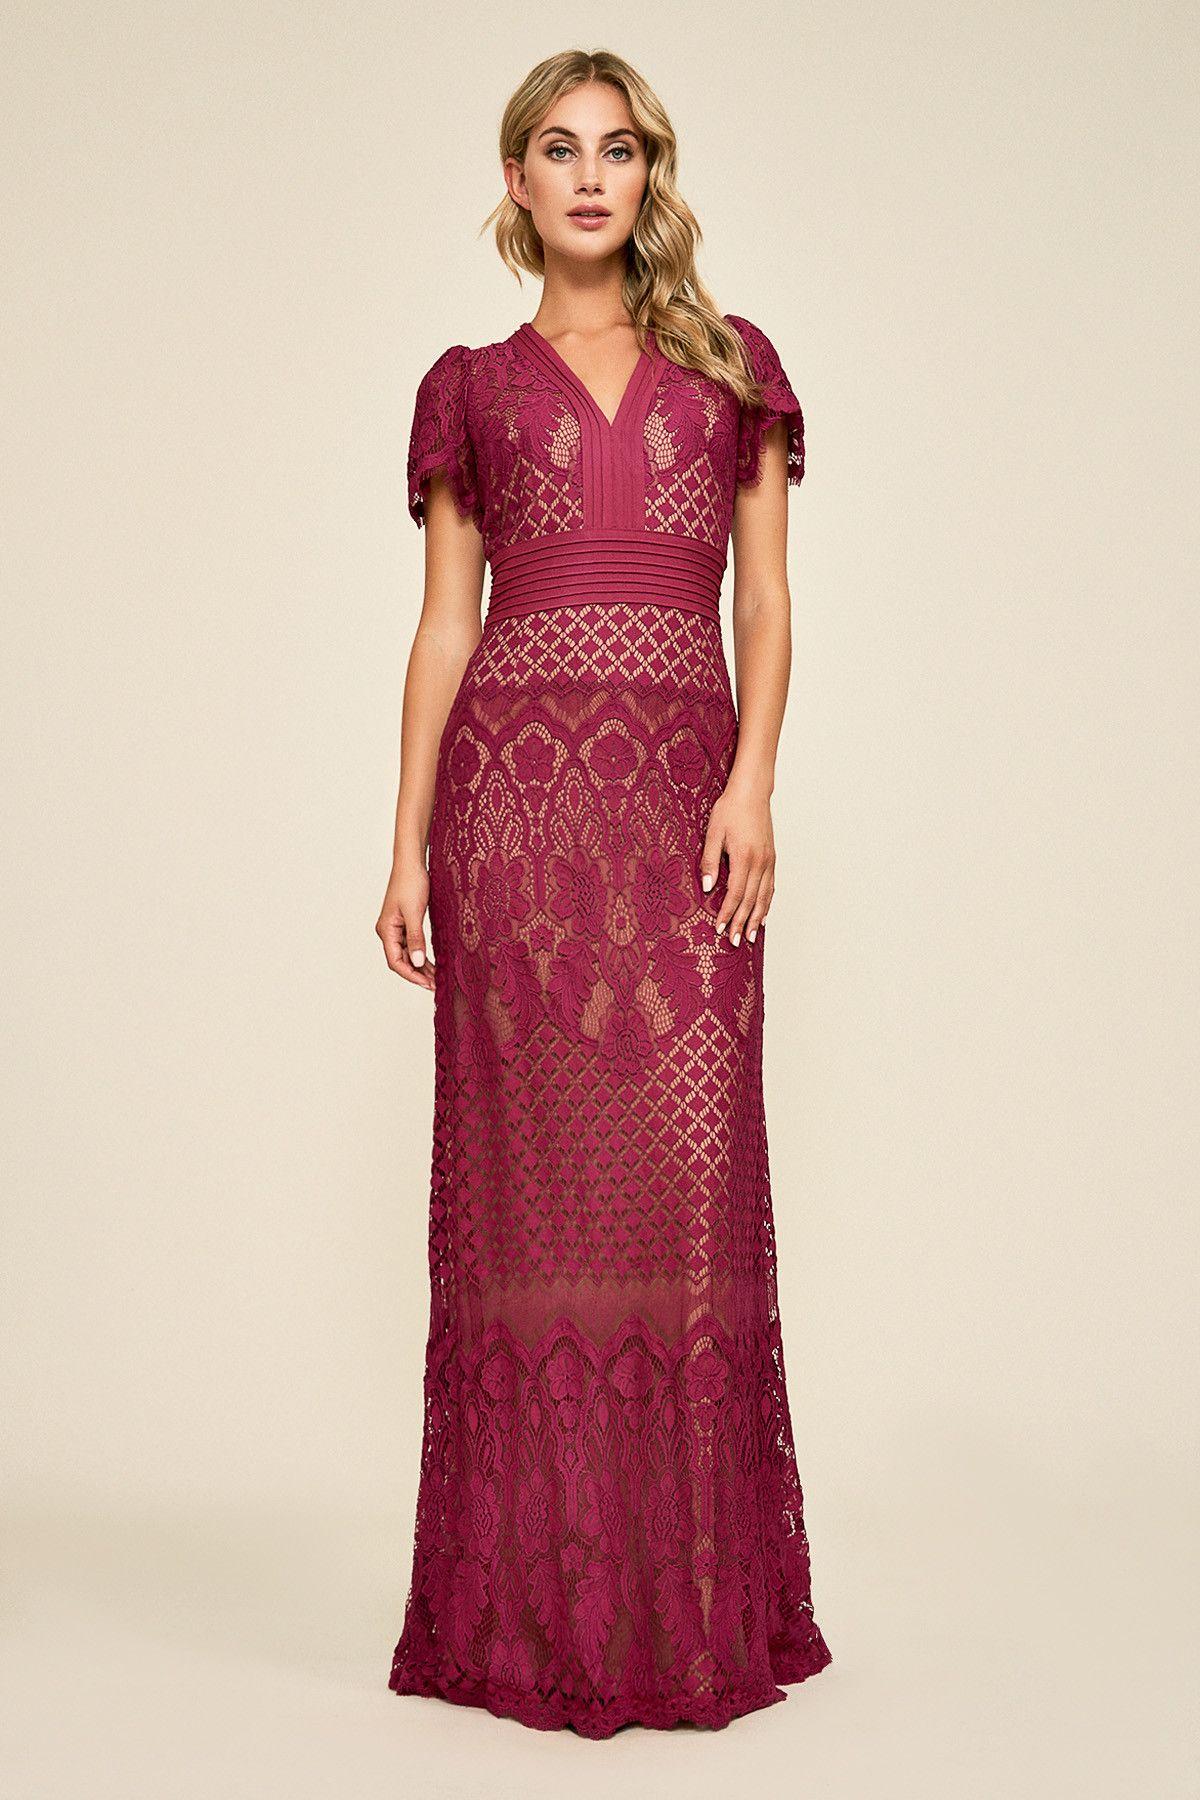 Dumin lace gown tadashi shoji lace gown burgundy